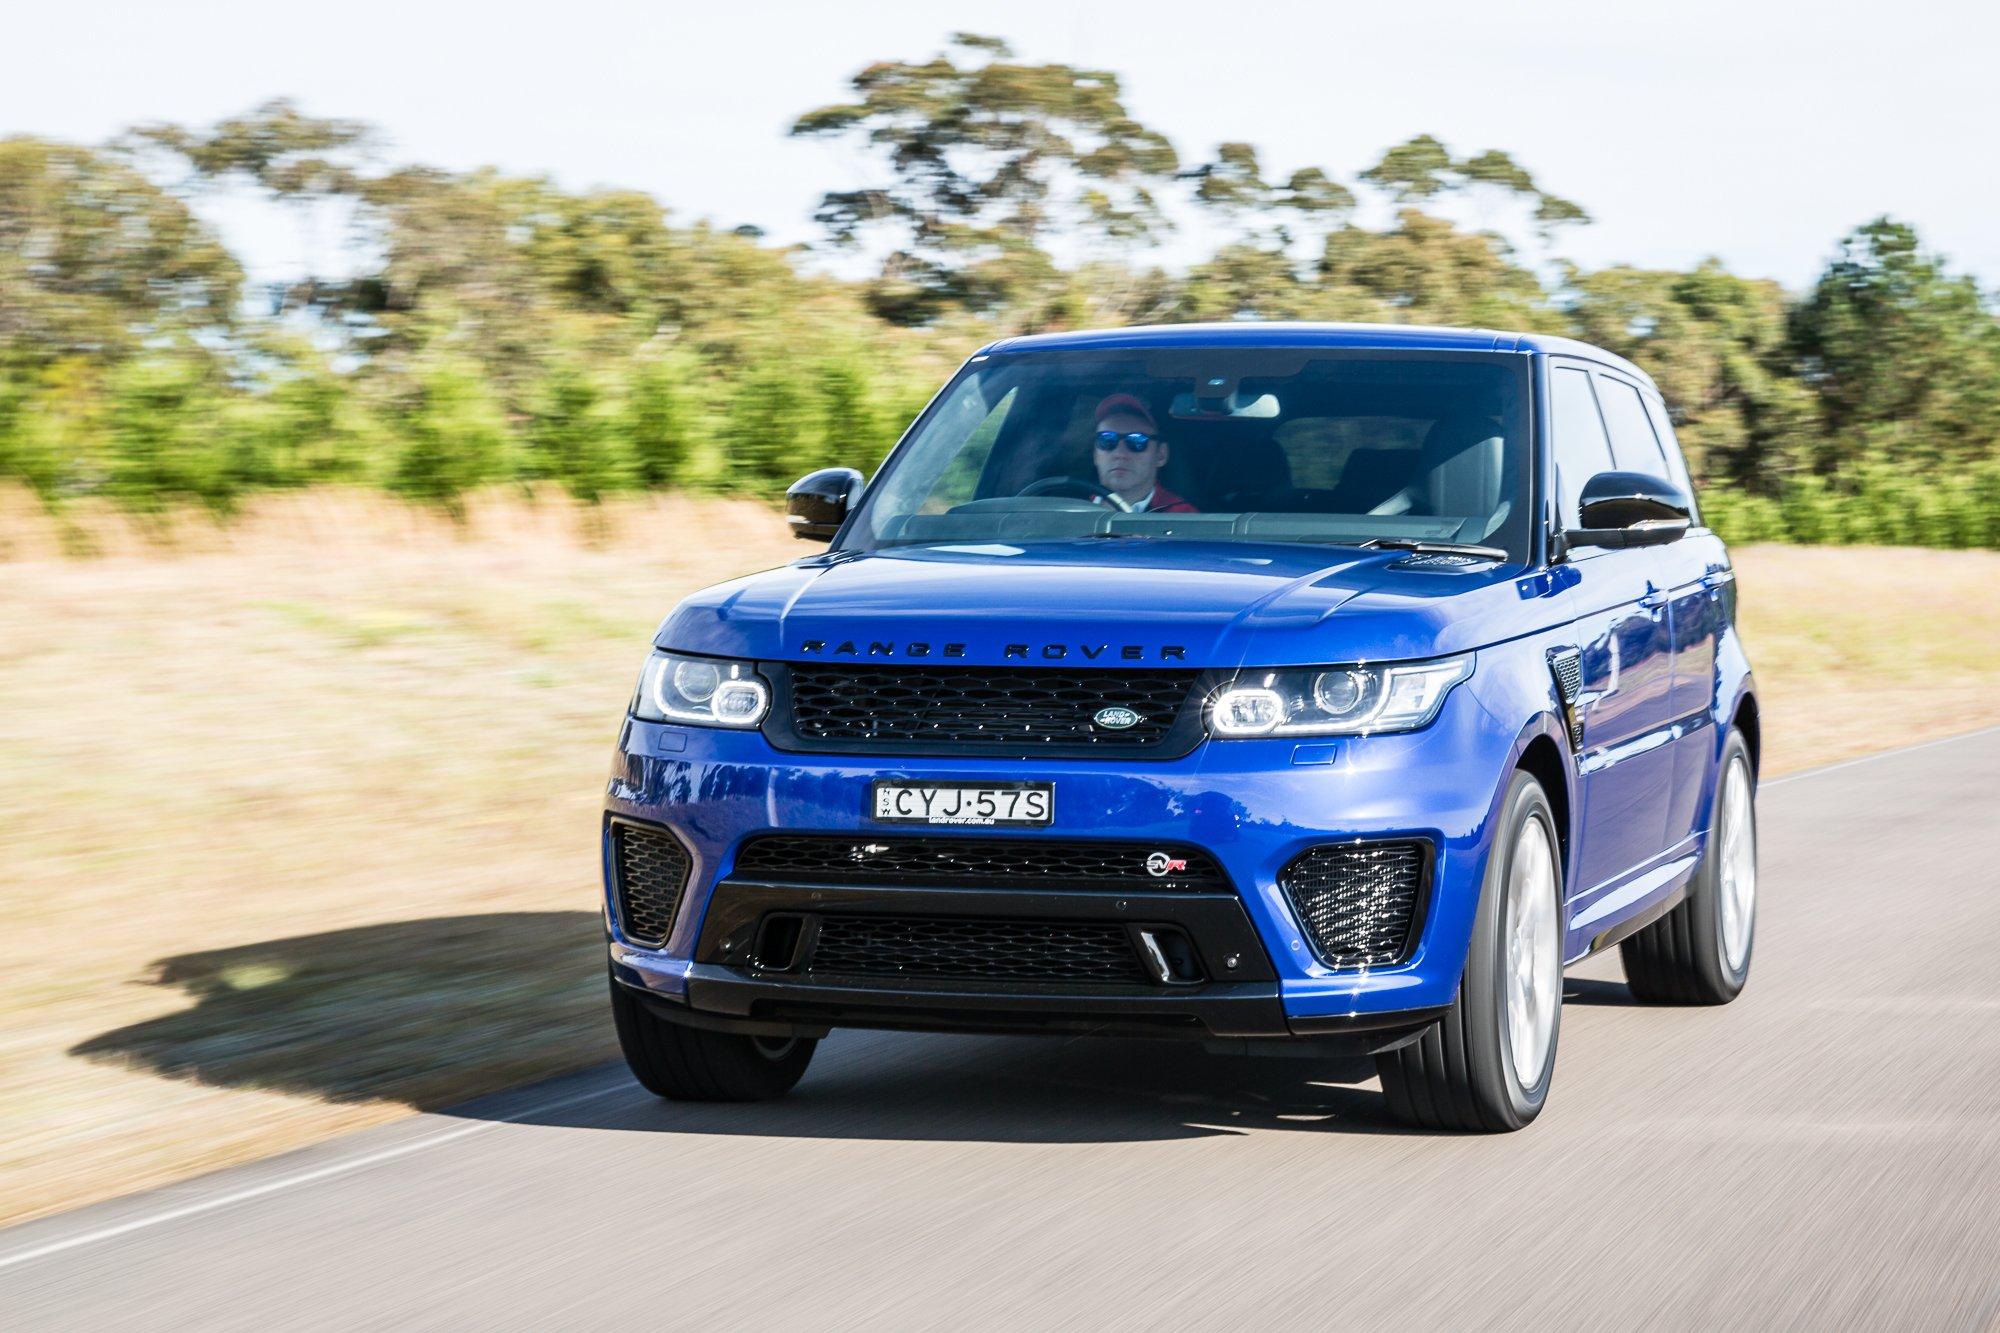 2015 Range Rover Sport Svr Review Caradvice